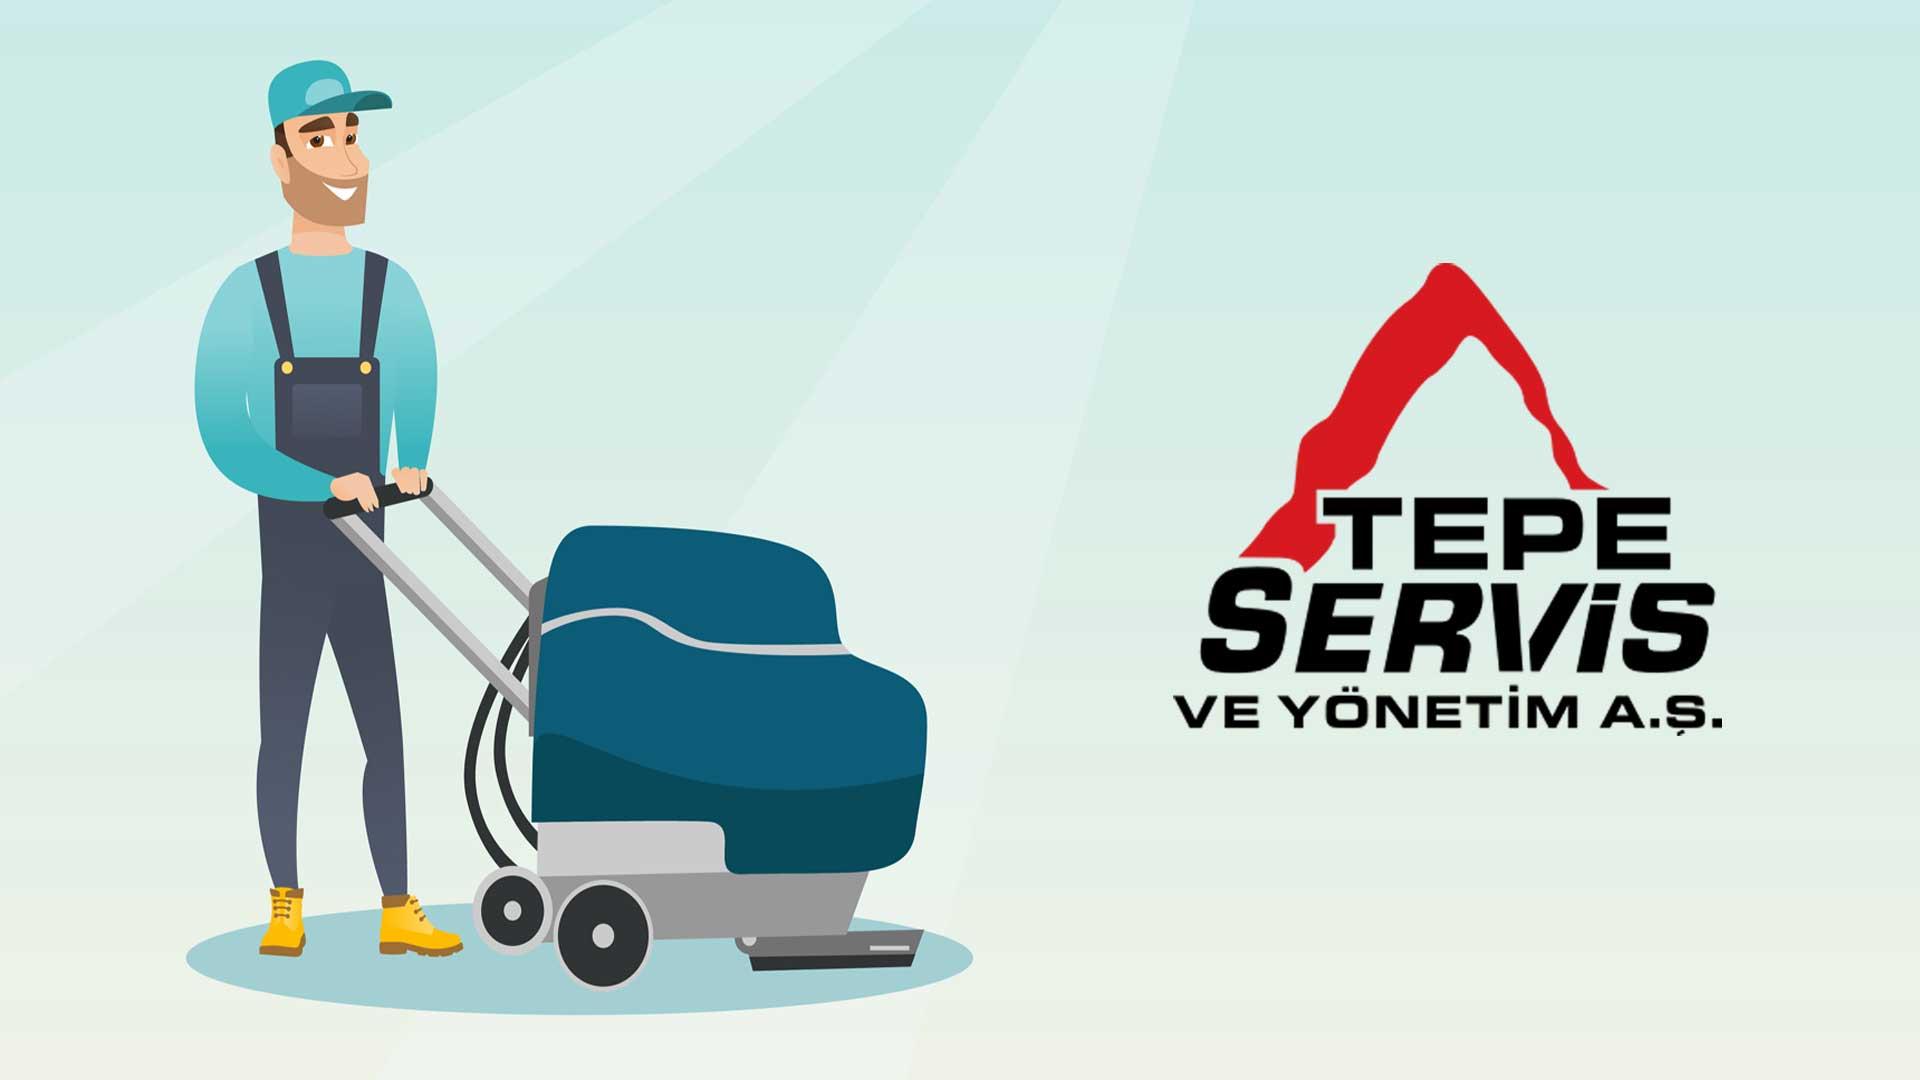 Tepe Servis Solution